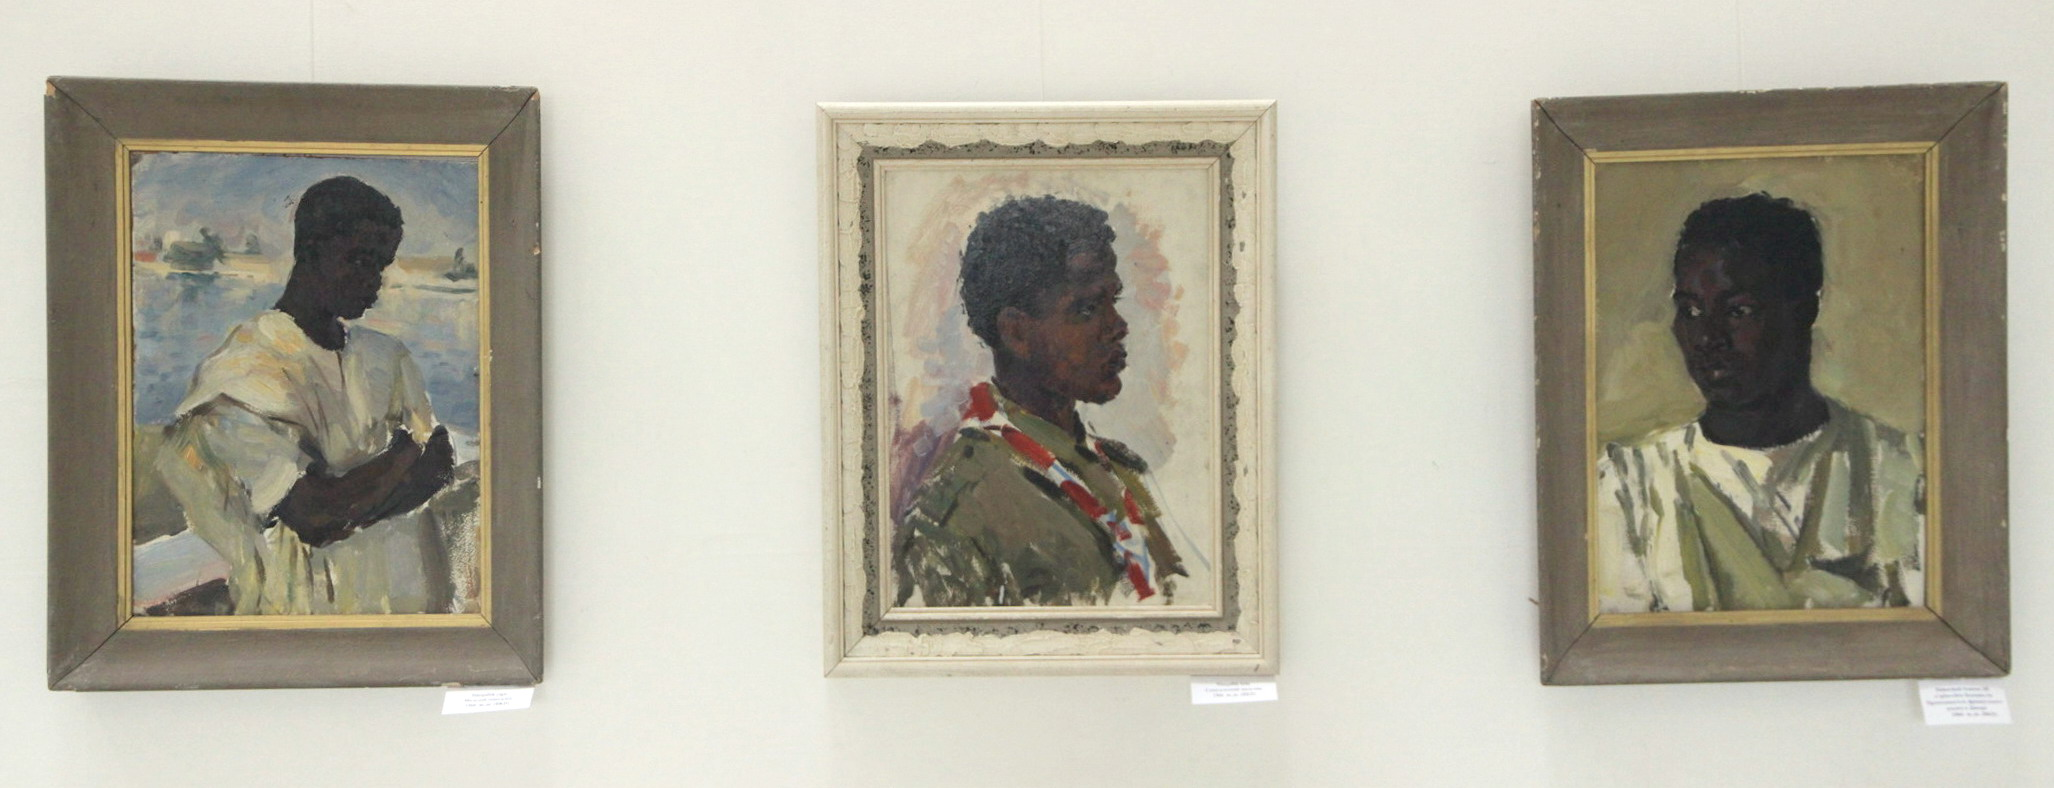 Абдулхак Абдуллаев. Серия портретов Африканского периода